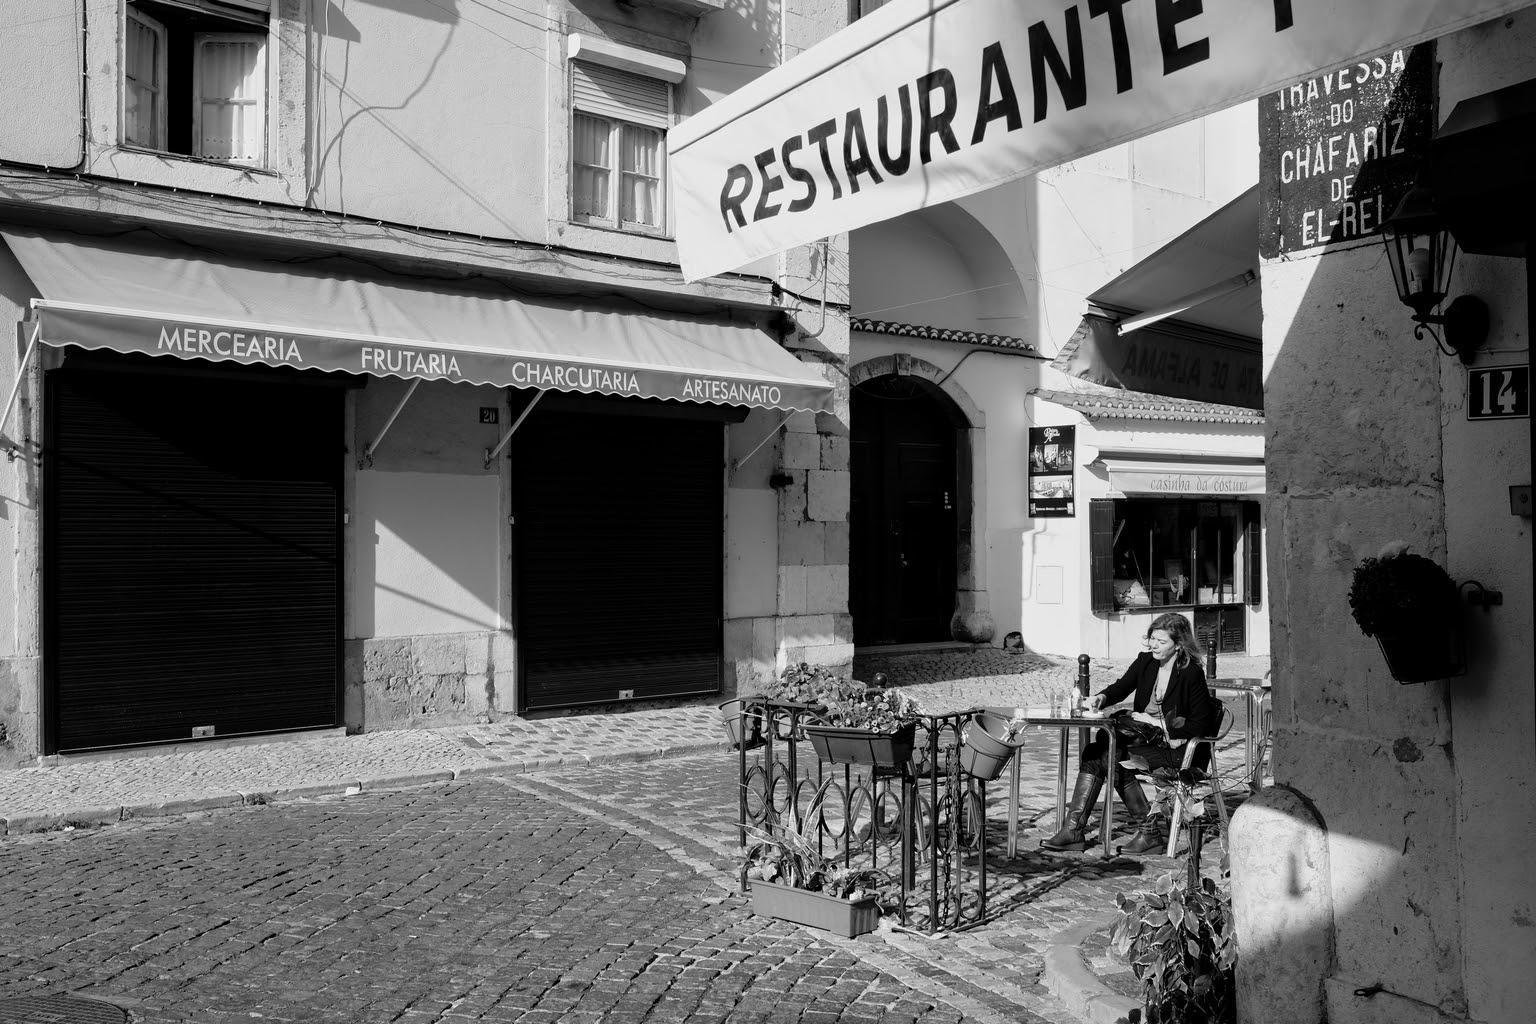 Lisbon-20151215-0069DT.jpg